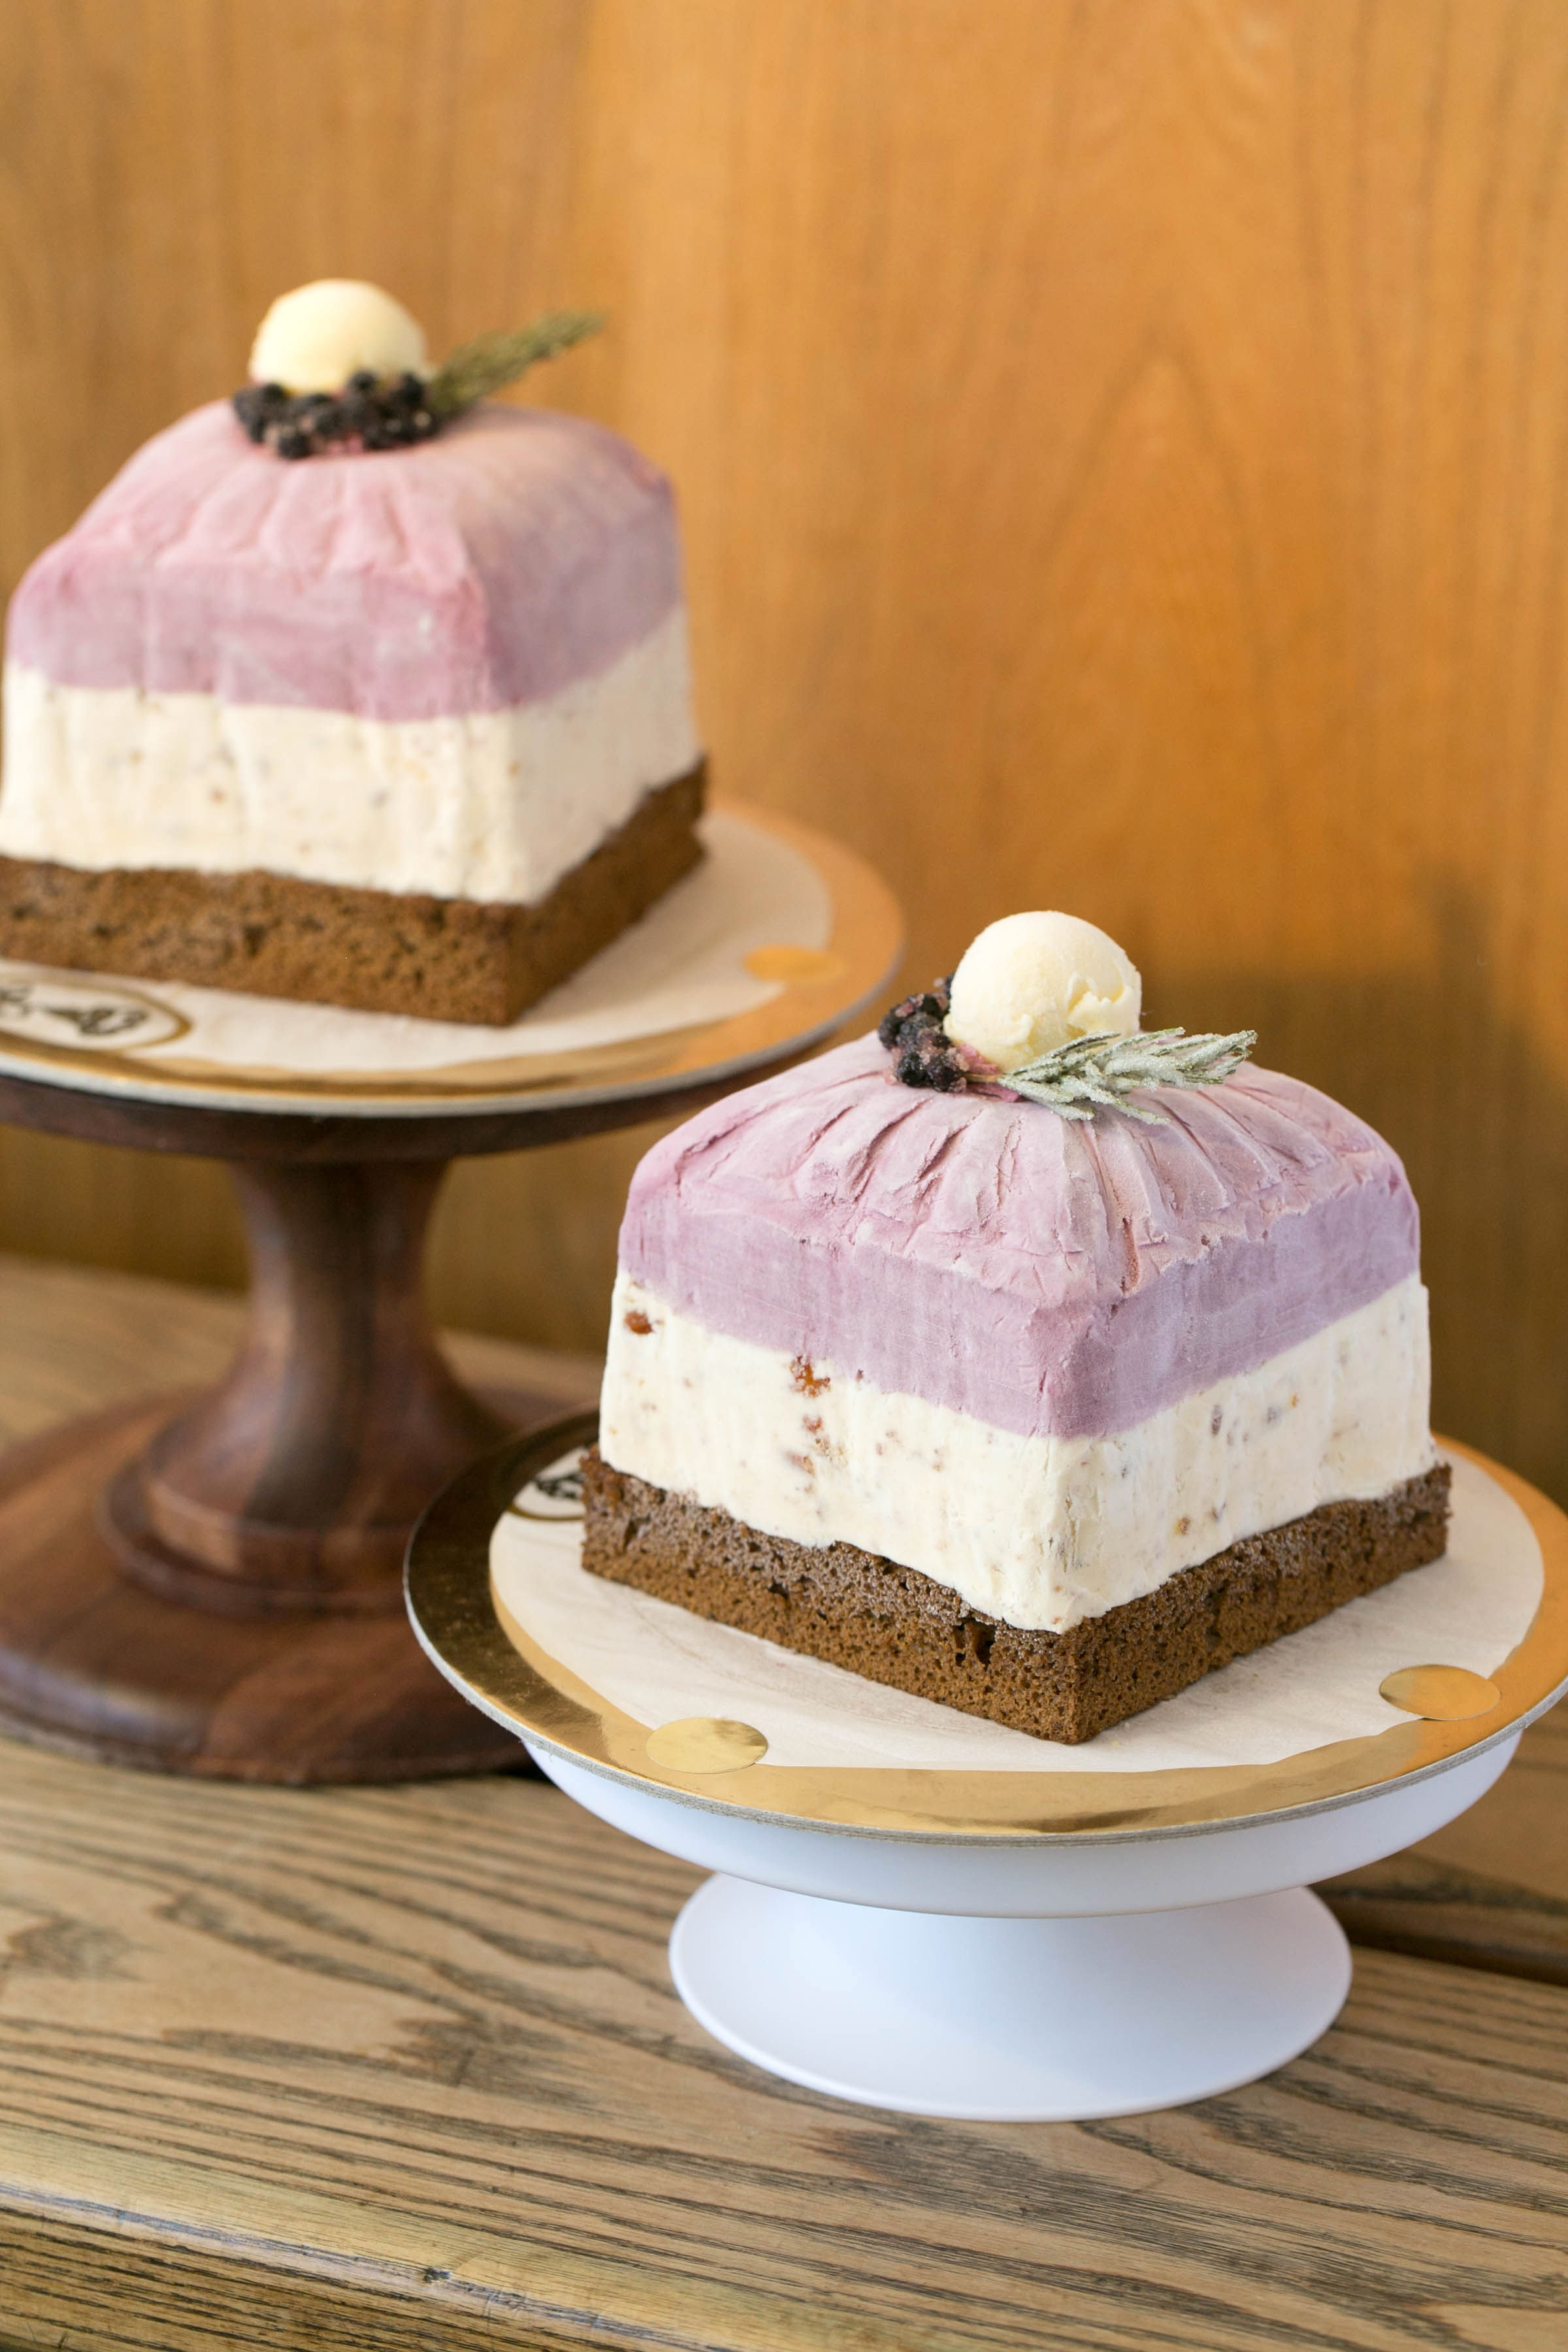 Huckleberry-panforte tea cake